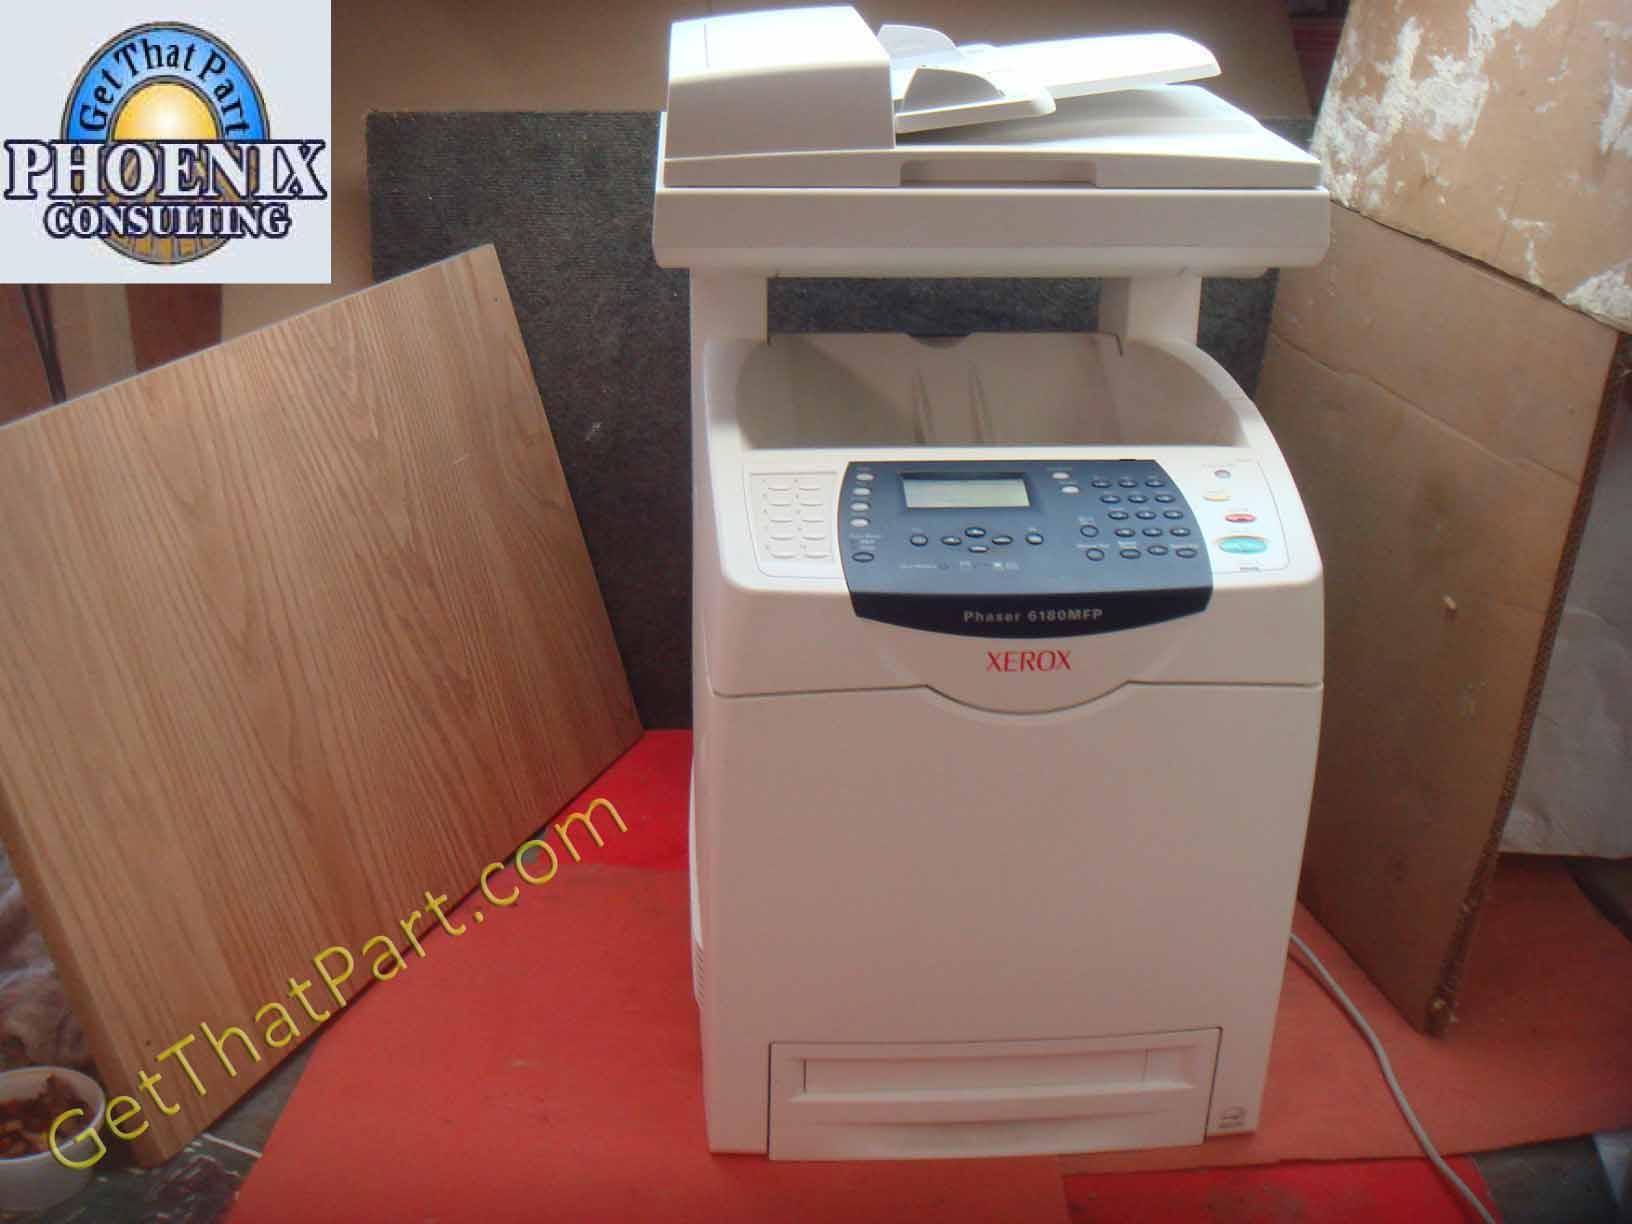 Xerox color laser printers - Xerox Phaser 6180mfp Duplex Network Multifunction Color Laser Printer